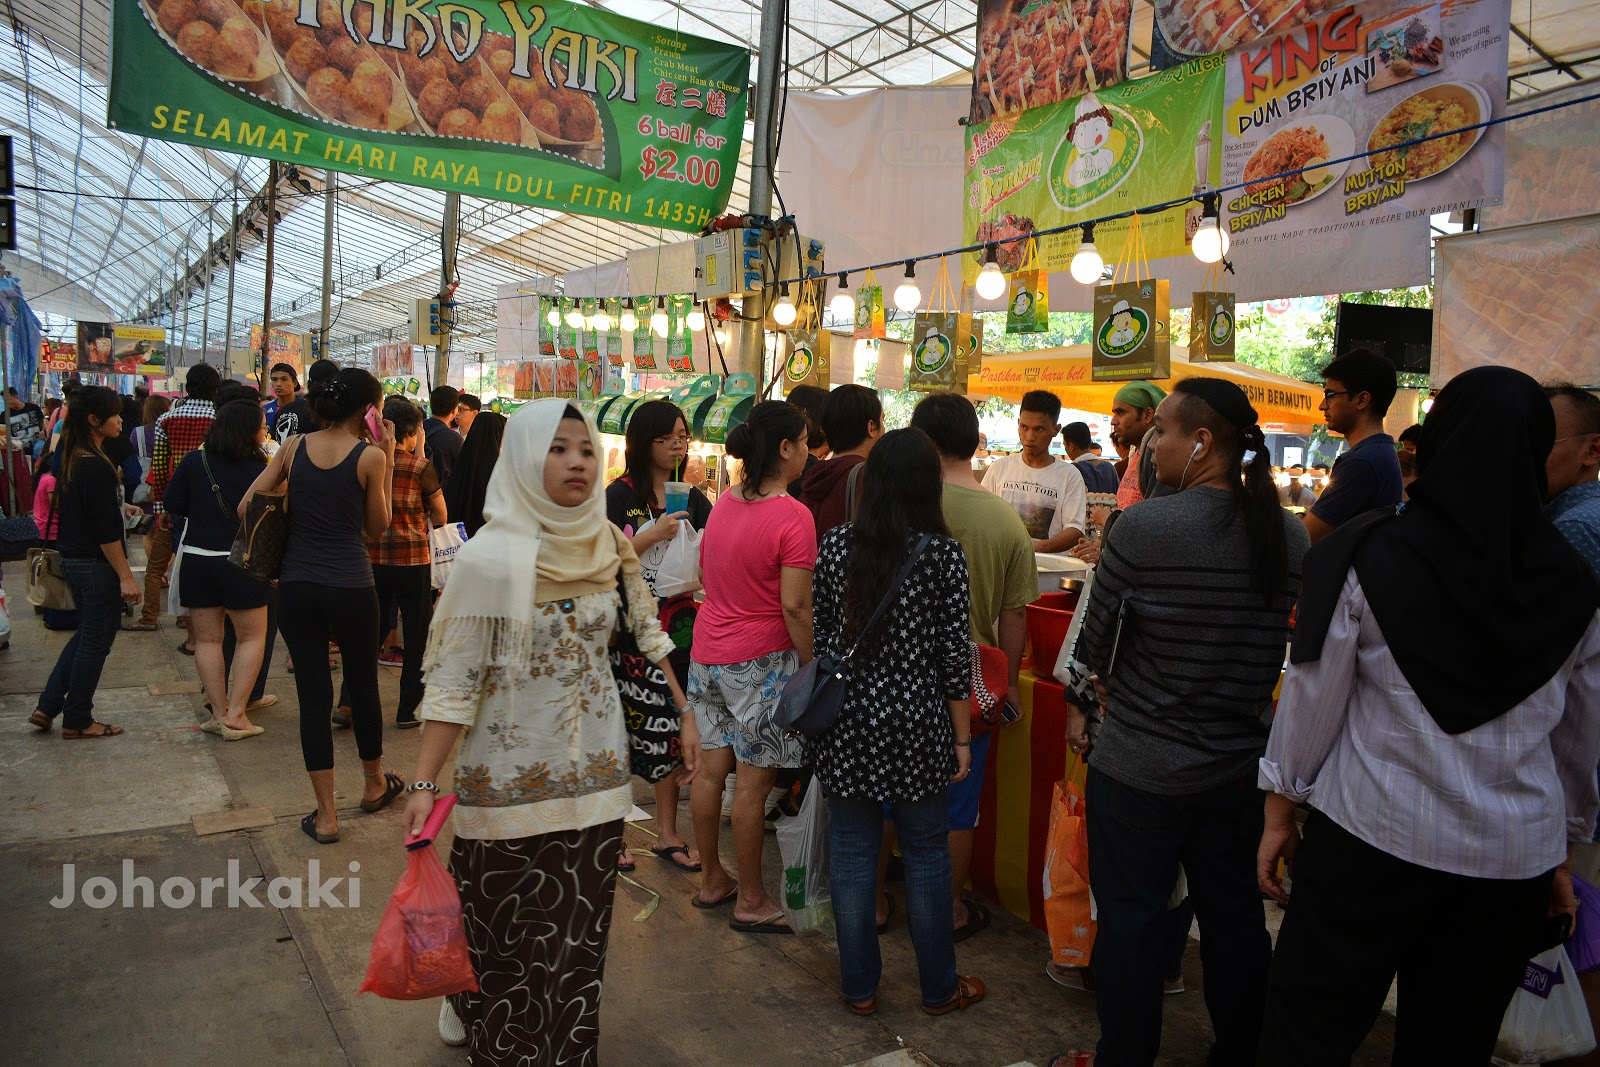 Ramadan Bazaar In Singapore Geylang Serai Johor Kaki